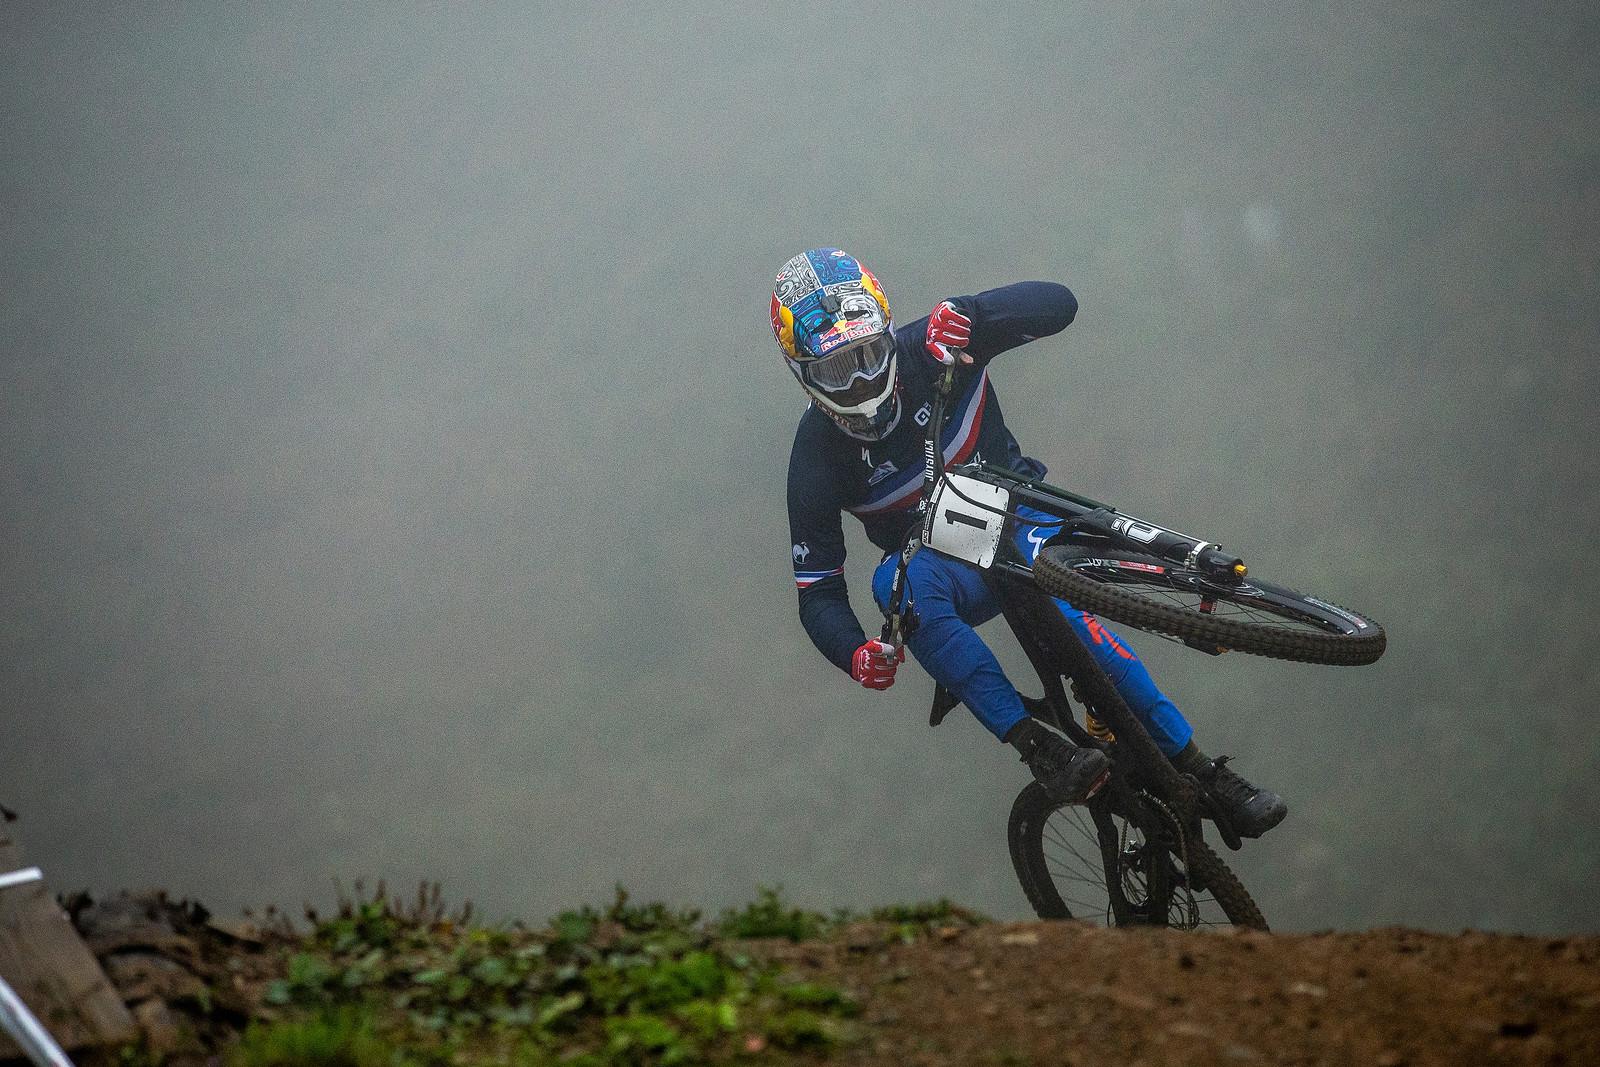 Loic Bruni - WORLD CHAMPS WHIPFEST - Mountain Biking Pictures - Vital MTB